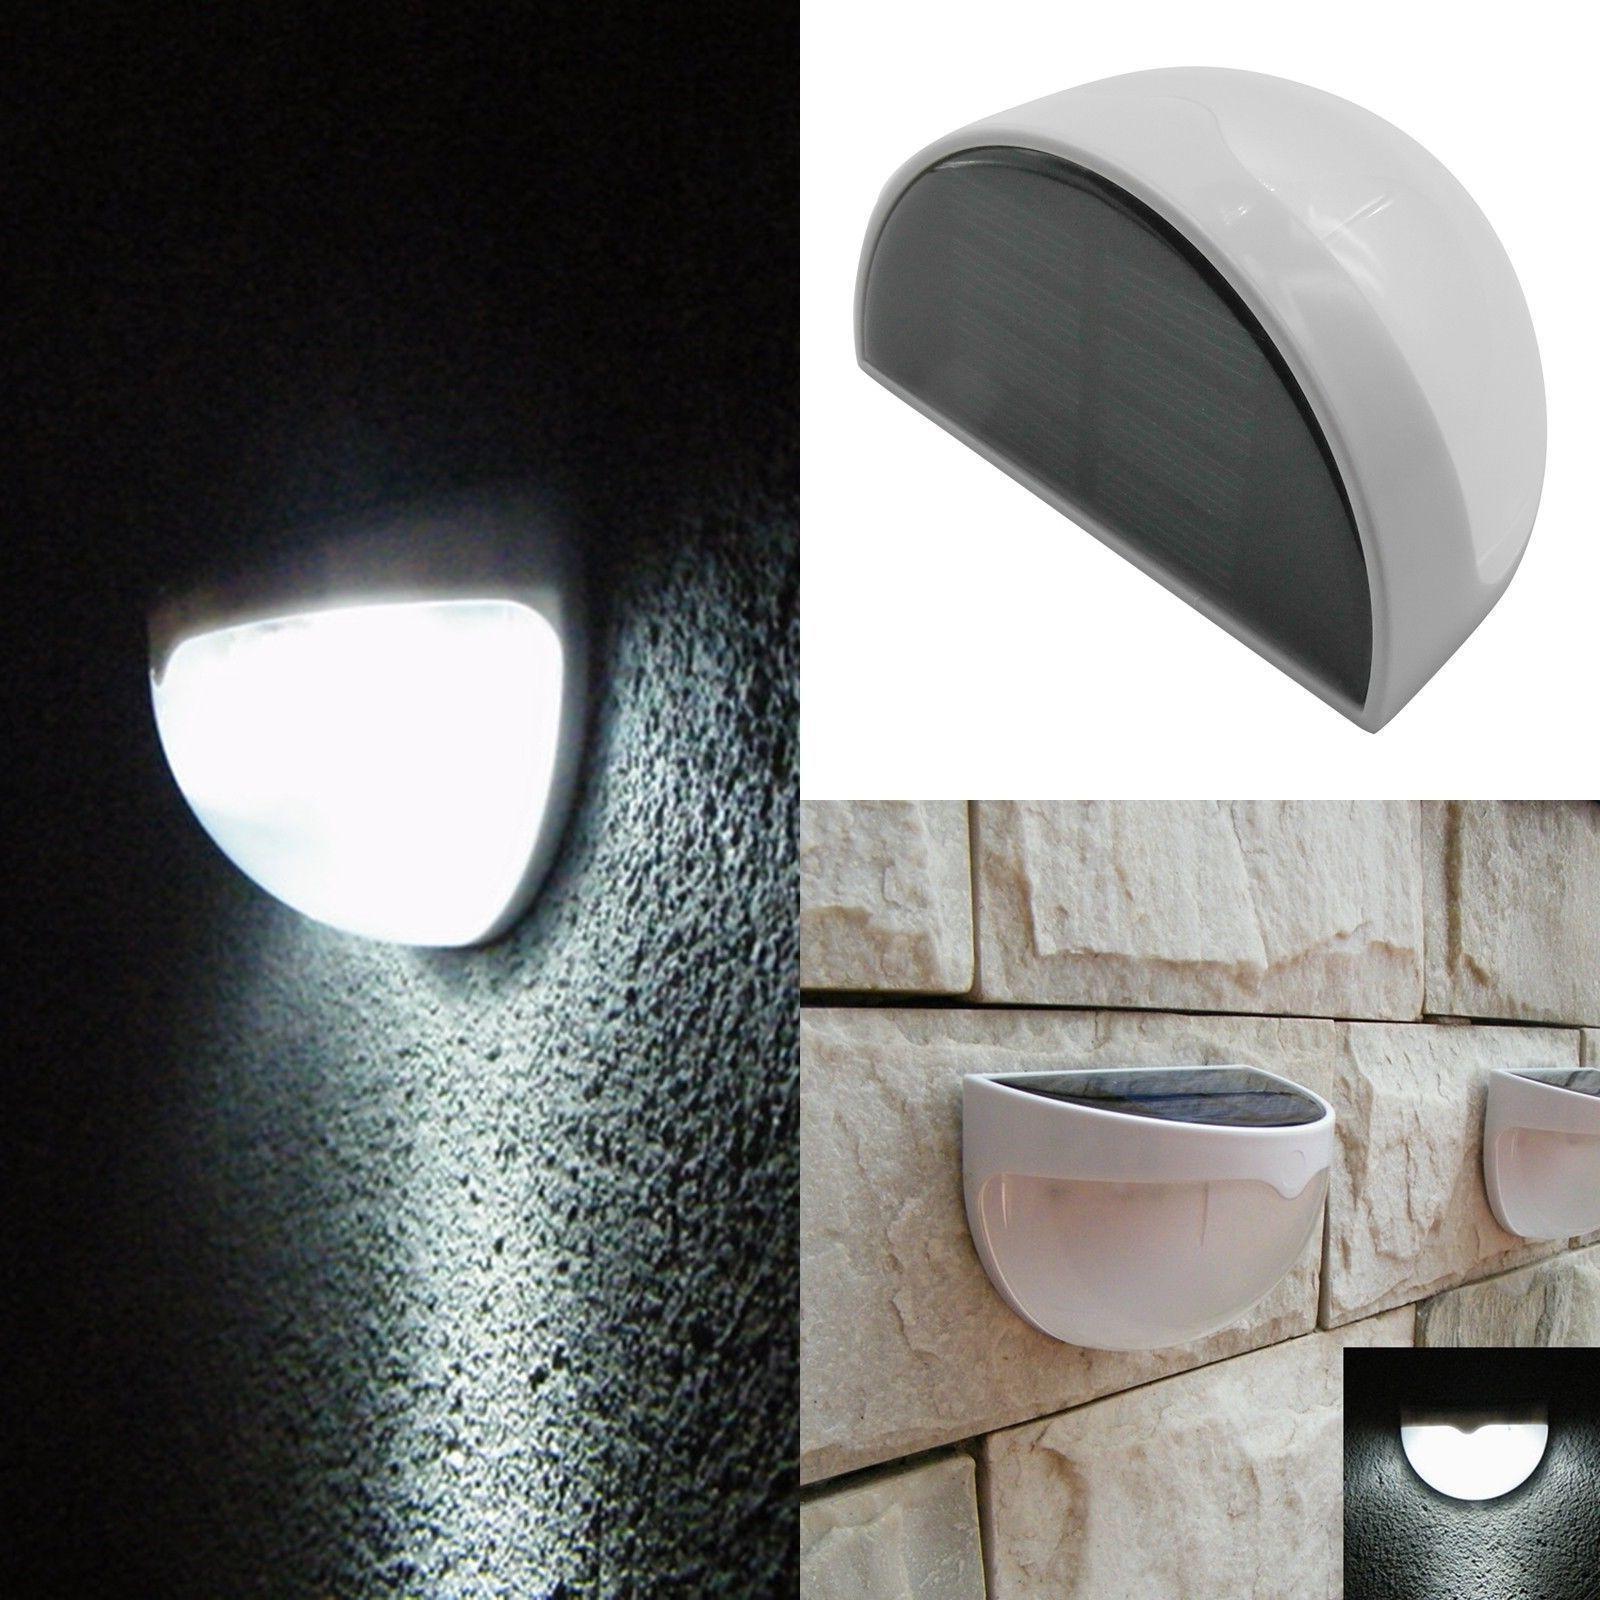 Solar Power 6 LED Outdoor Garden Fence Lamp